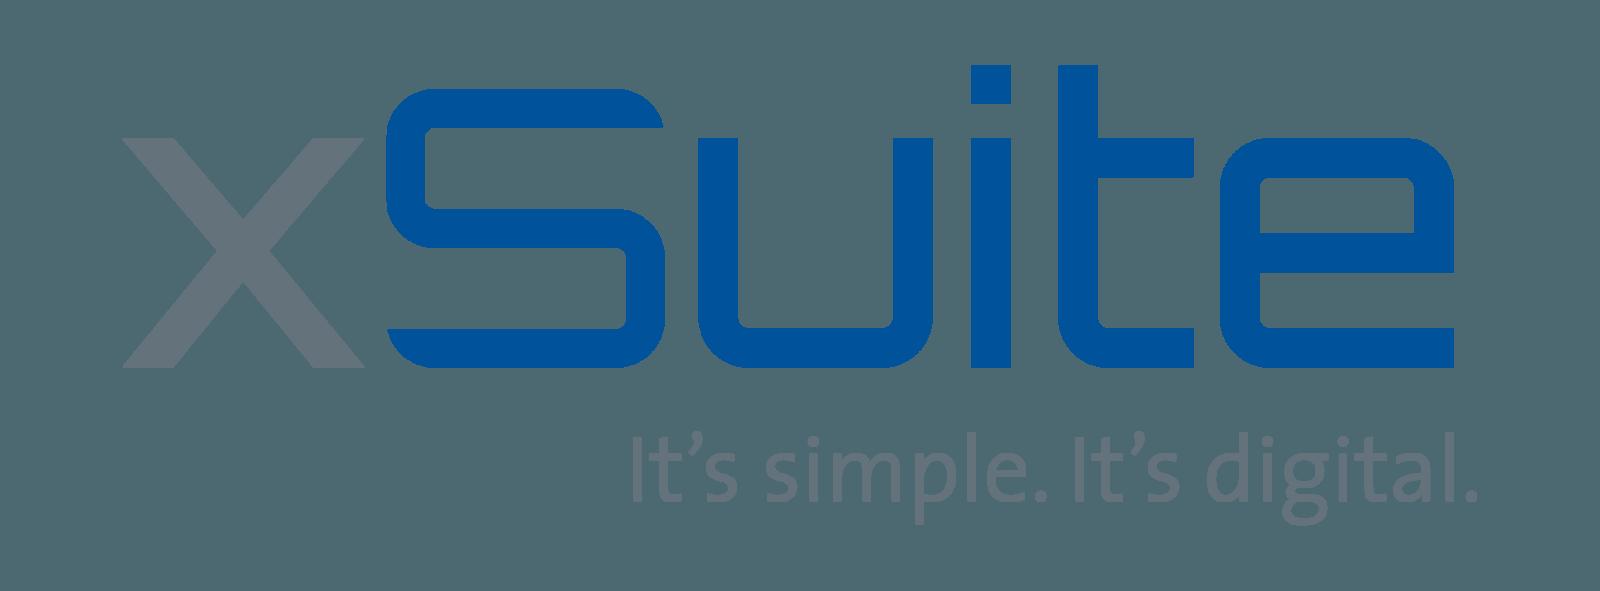 xSuite Solutions logo